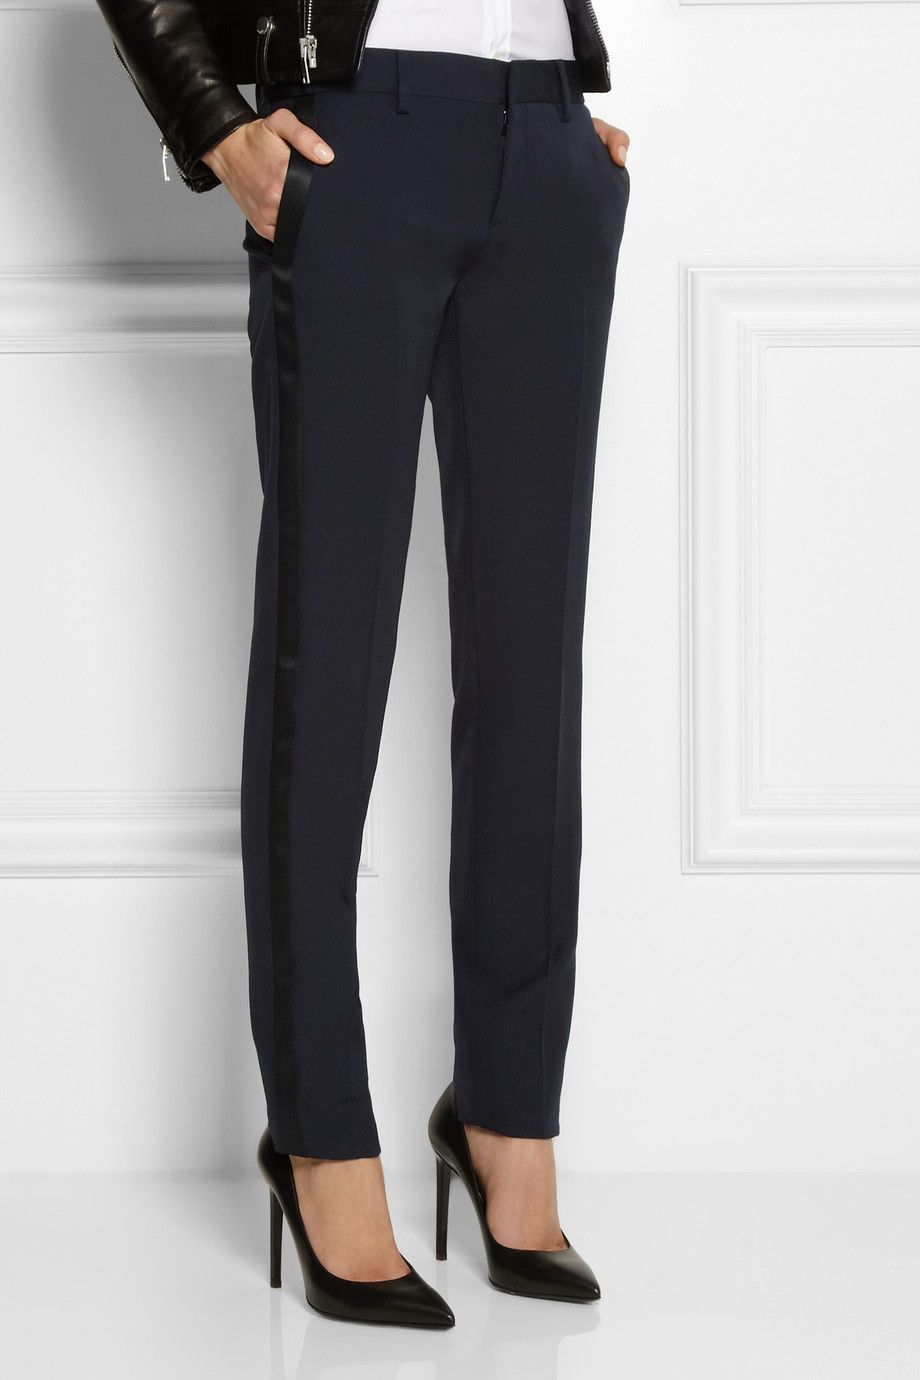 c1bbb2d745a Saint Laurent   Satin-trimmed wool tuxedo pants   NET-A-PORTER.COM ...